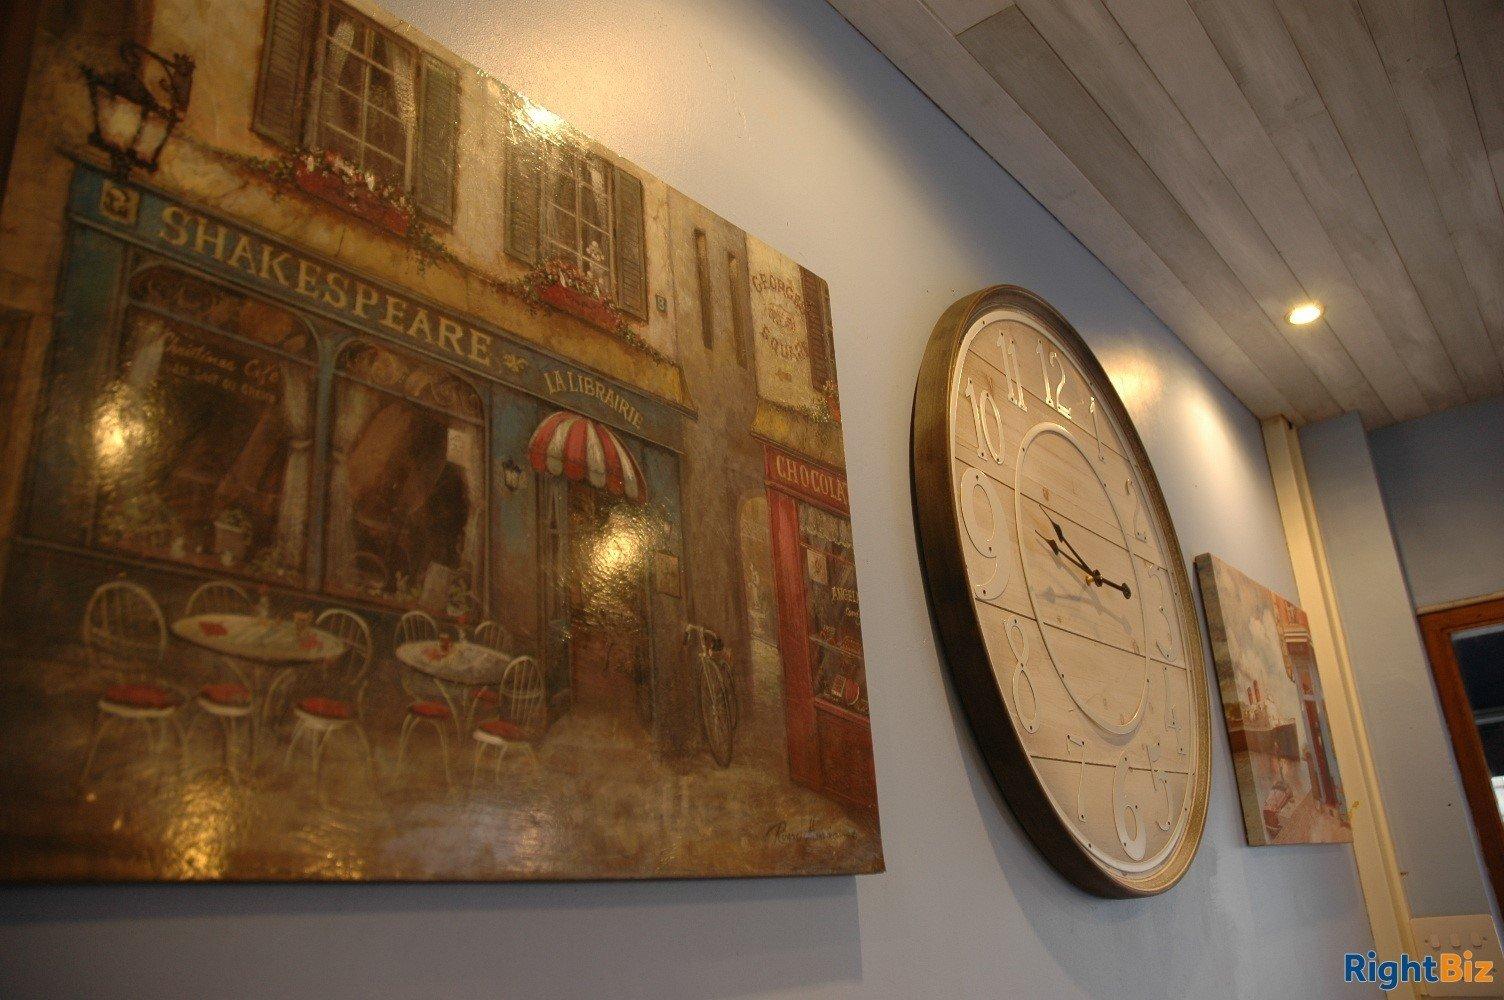 Premium Sandwich Shop and Delicatessen in Stourbridge, West Midlands *Offers Invited* - Image 4